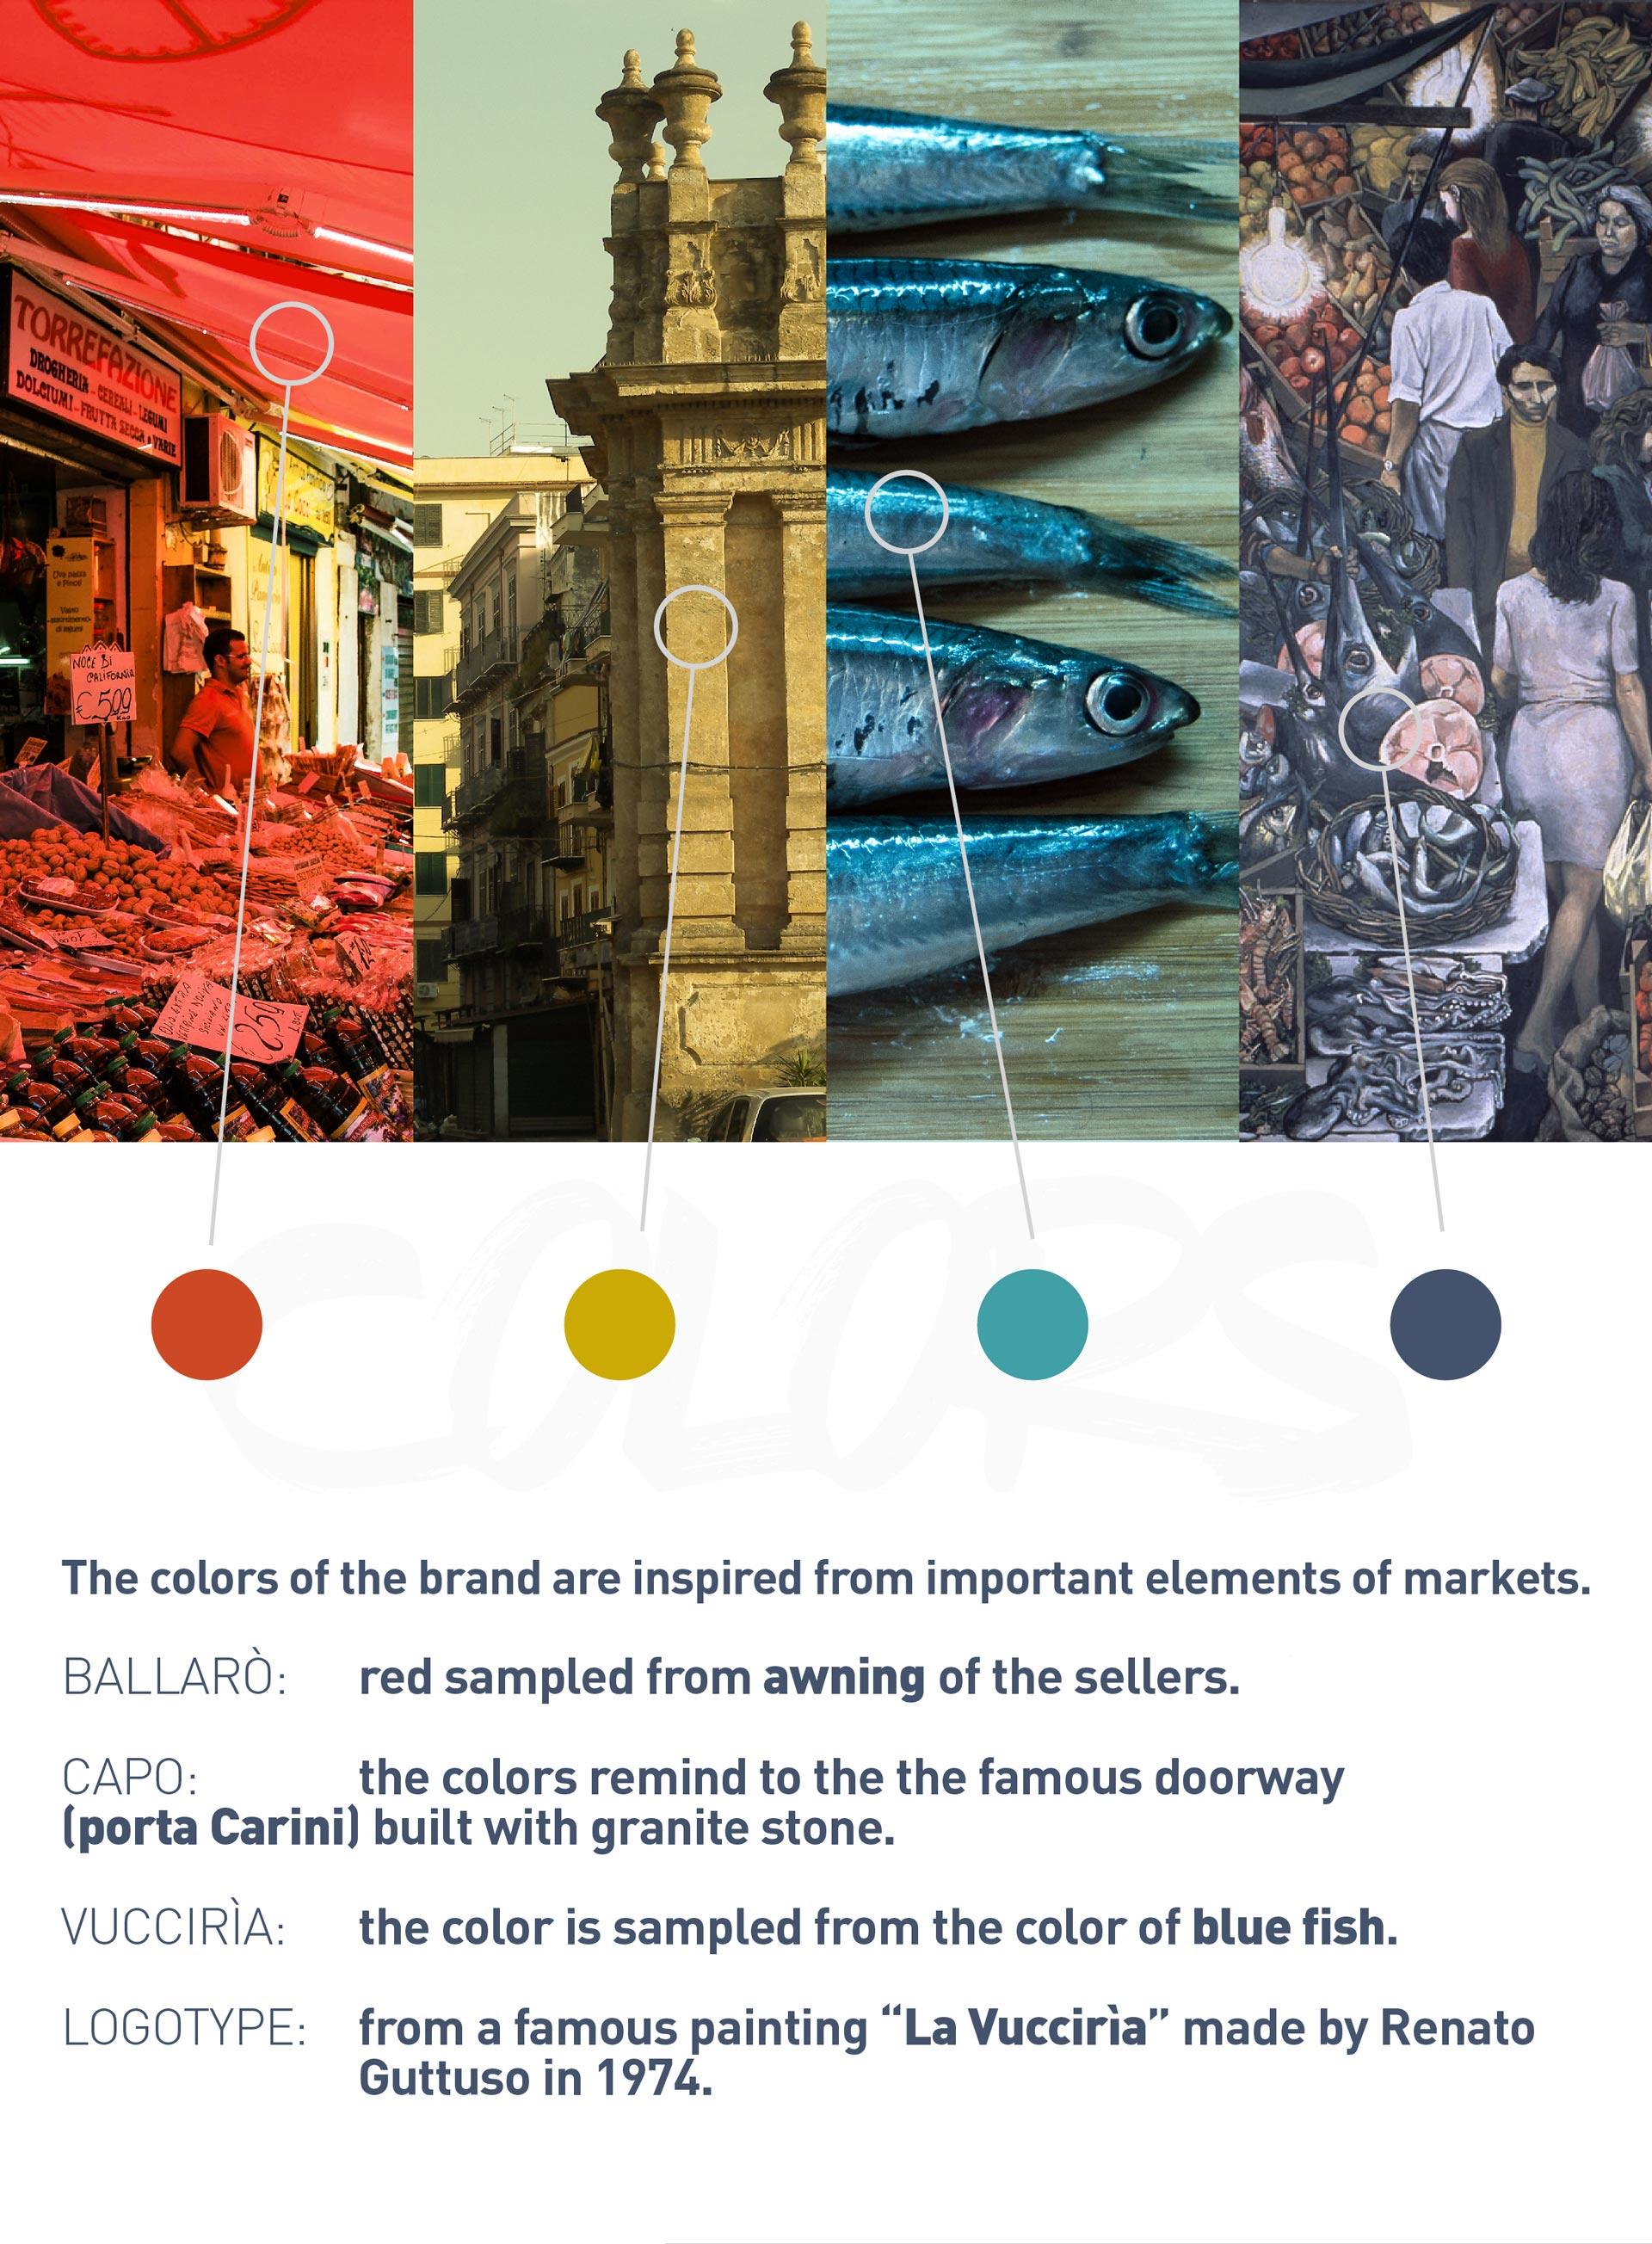 palermo_food_markets2